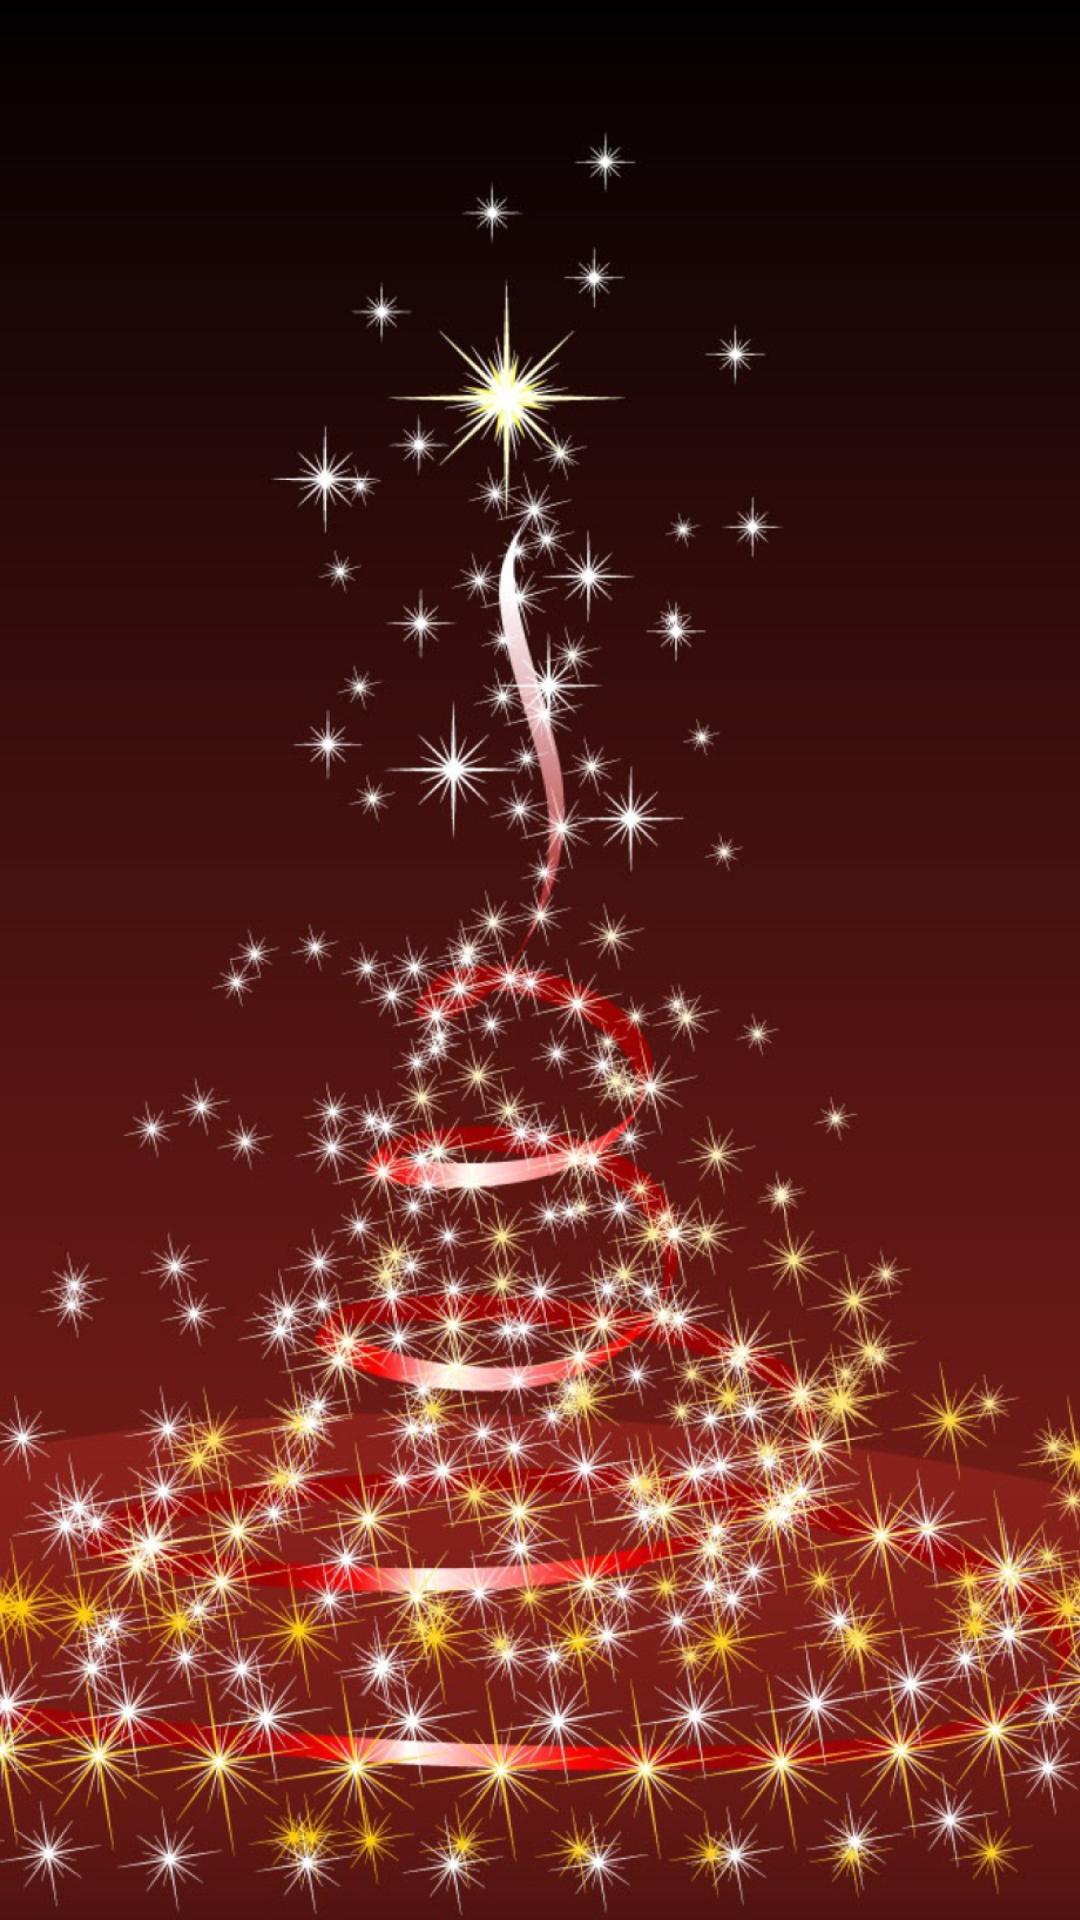 Black And Red Iphone Wallpaper Christmas Lights Iphone Wallpapers Pixelstalk Net